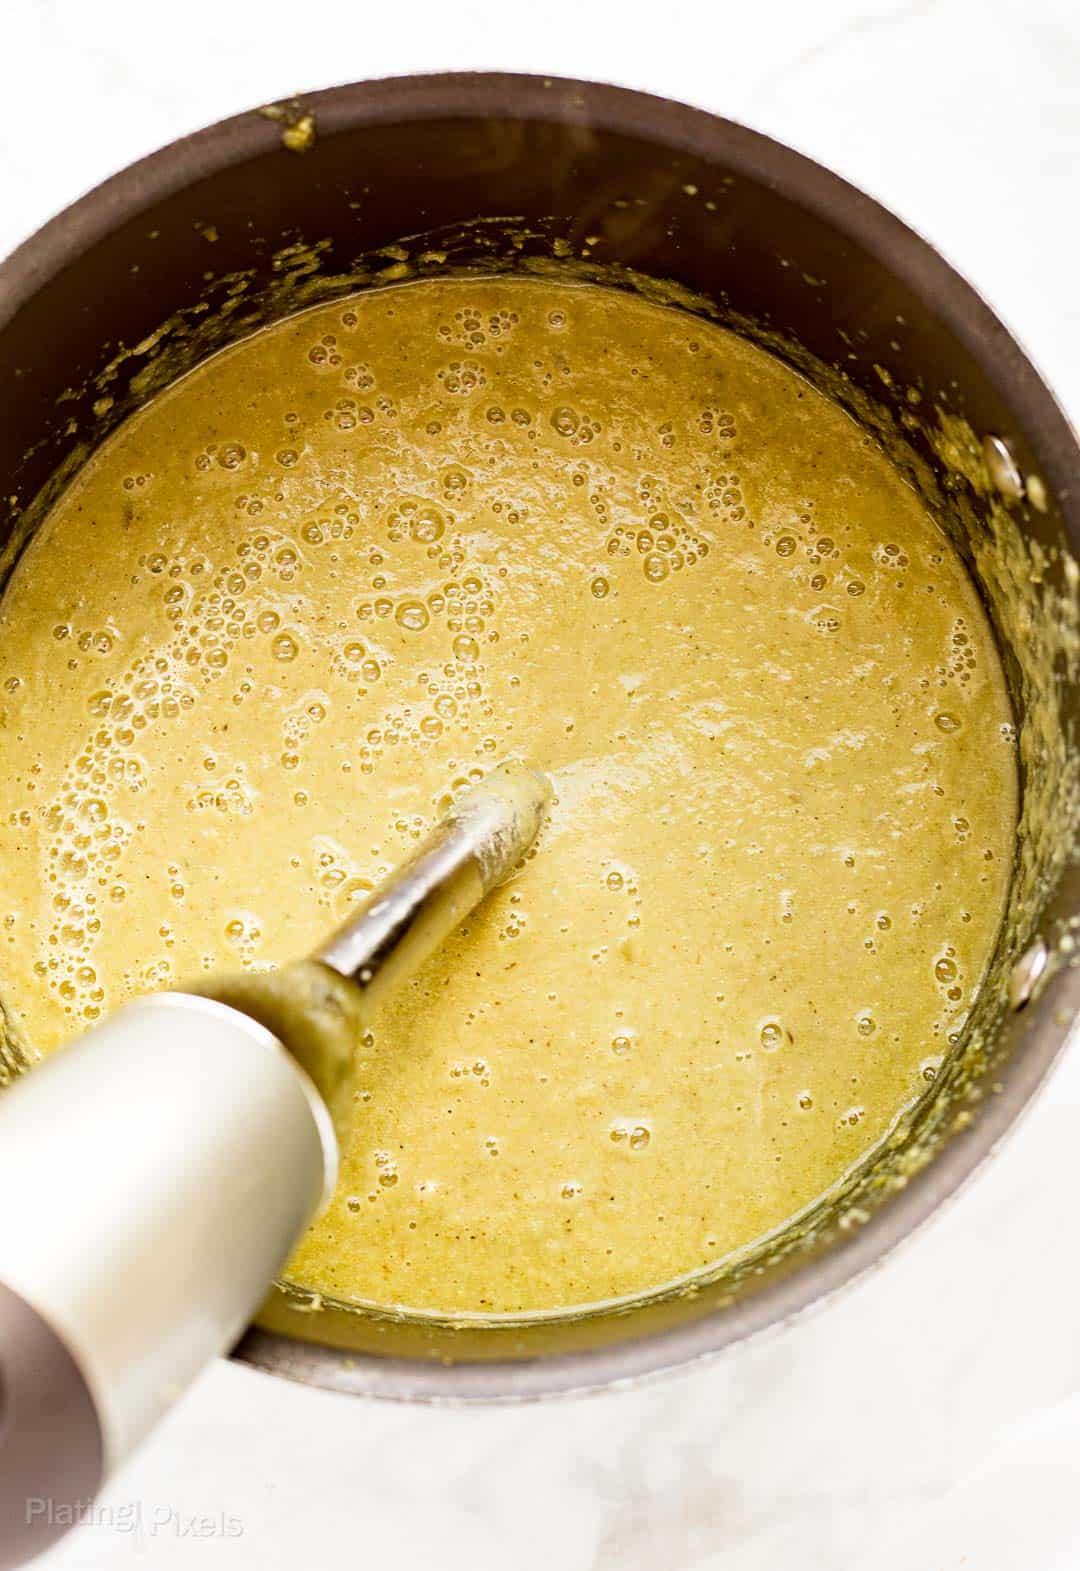 Process shot of blending leek soup with an immersion blender